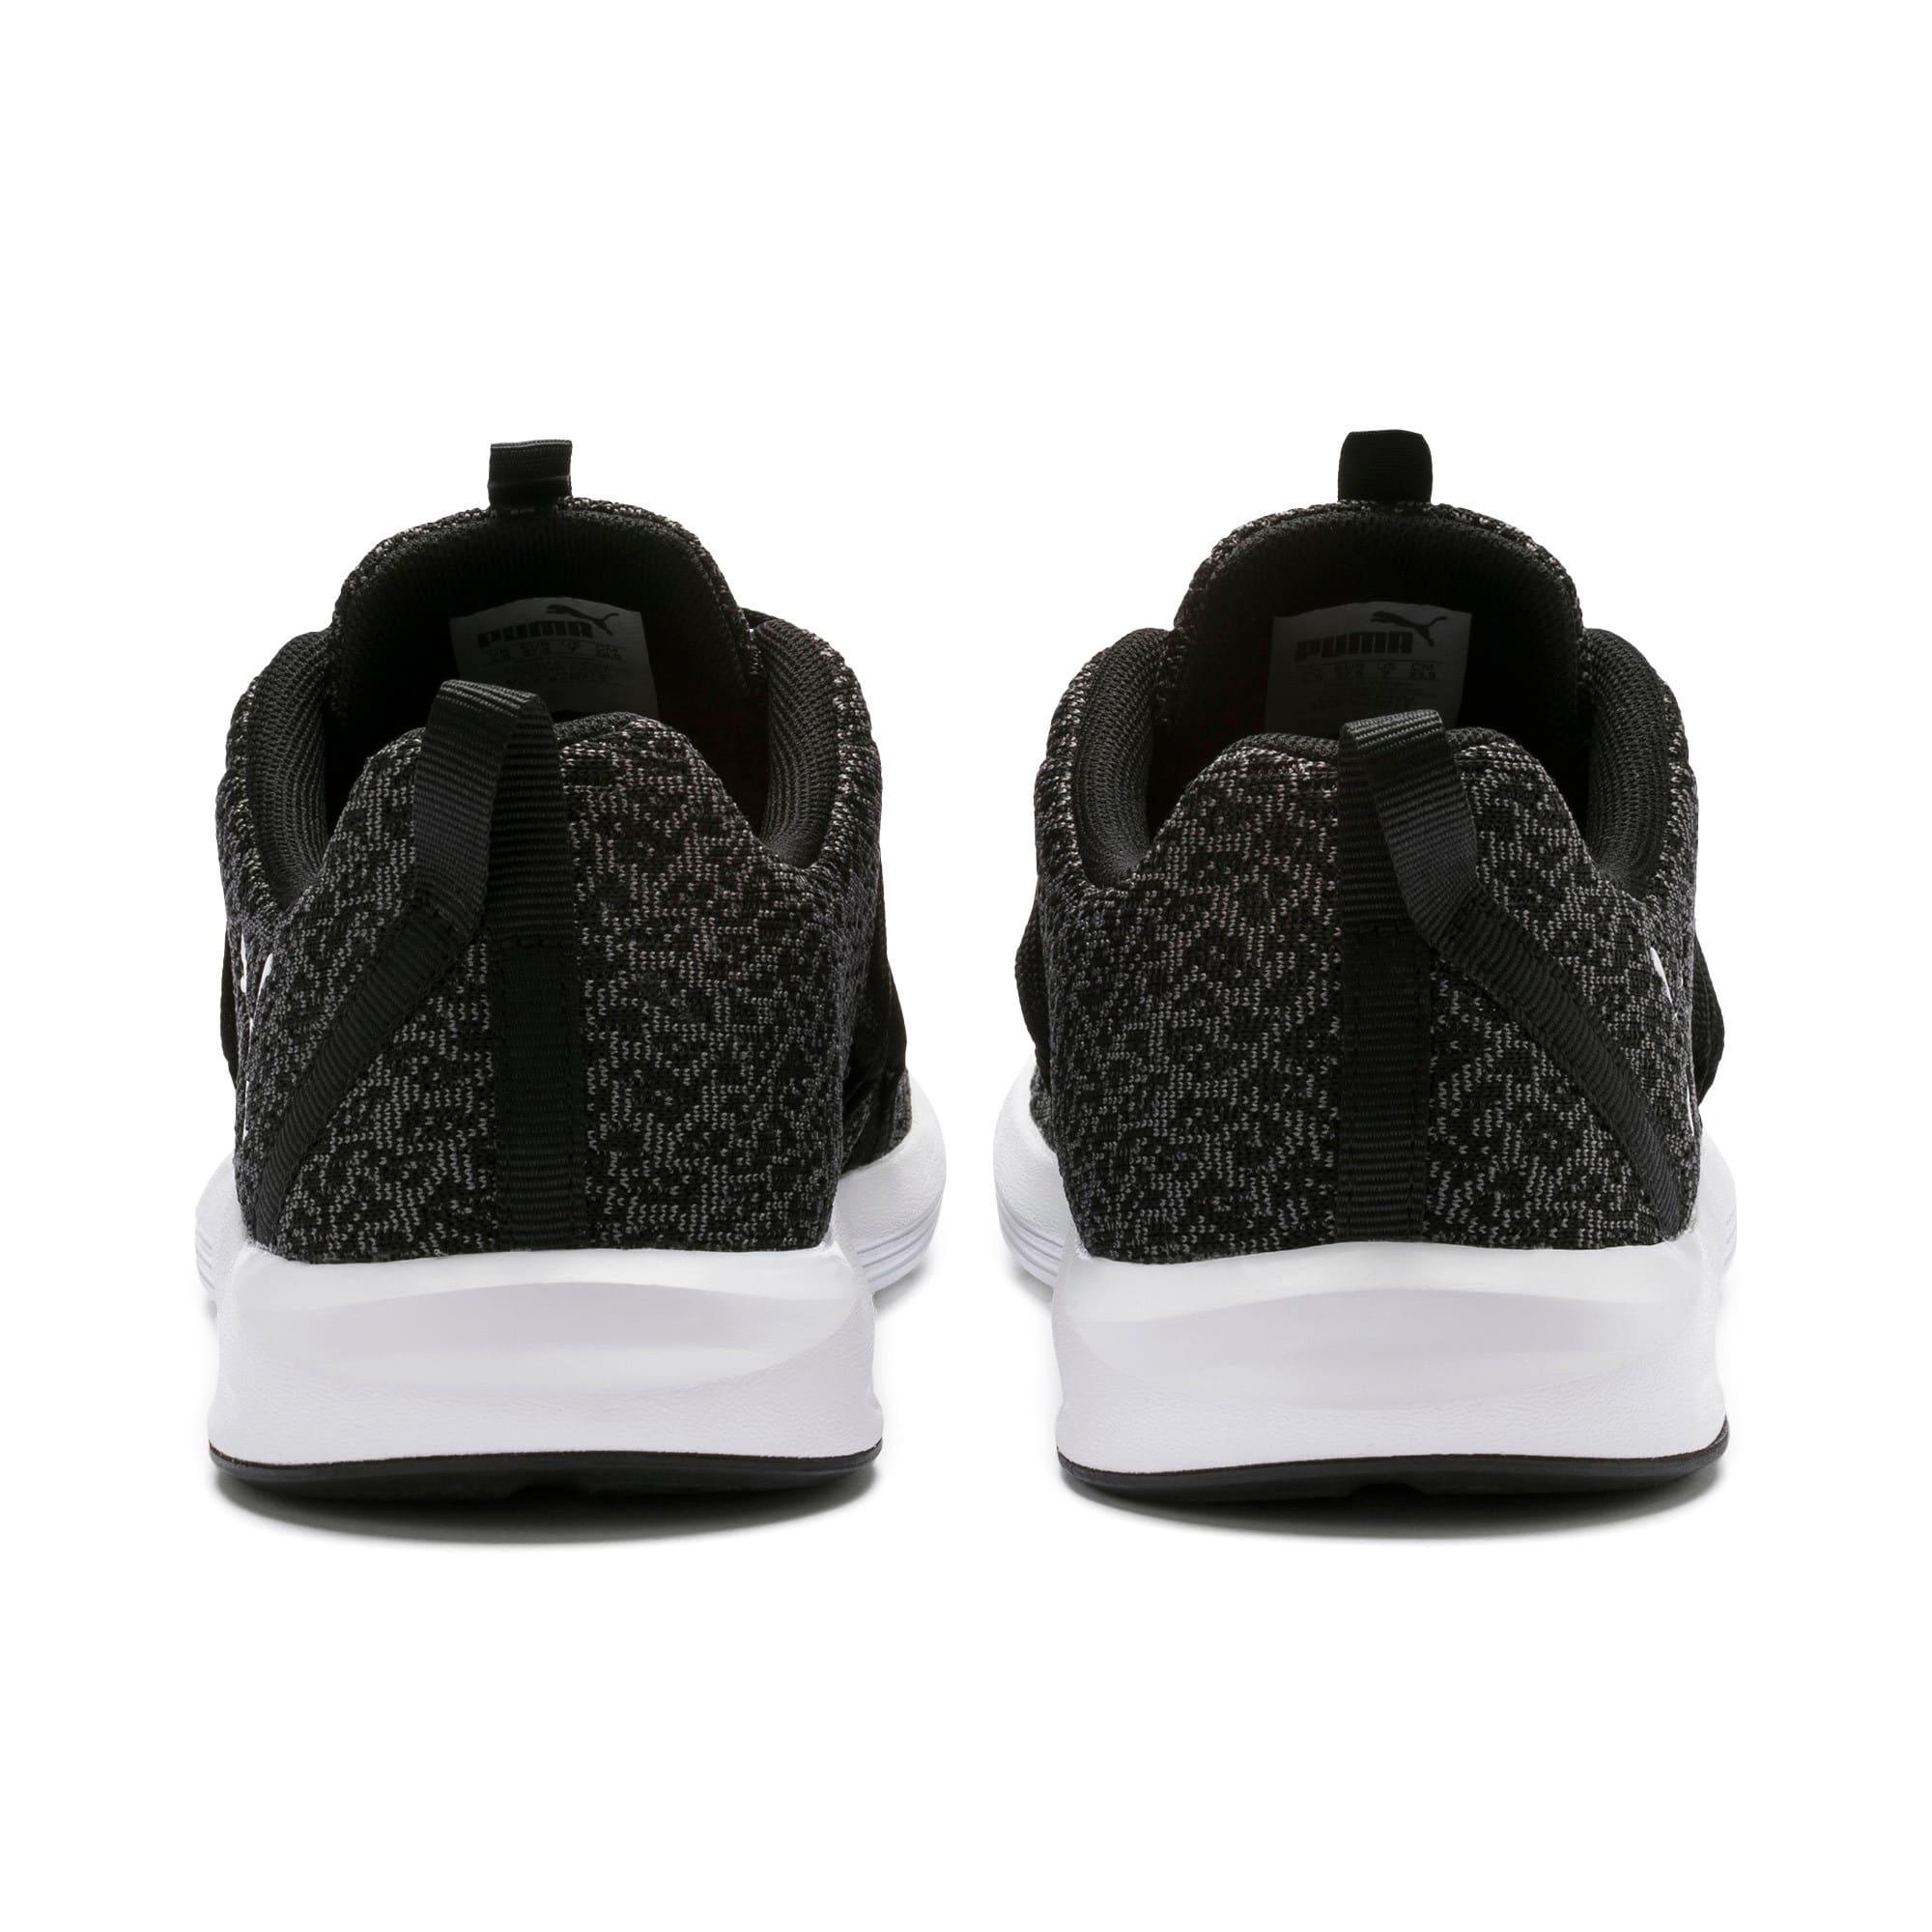 Thumbnail 4 of Prowl Alt Knit Women's Training Shoes, Puma Black-Puma White, medium